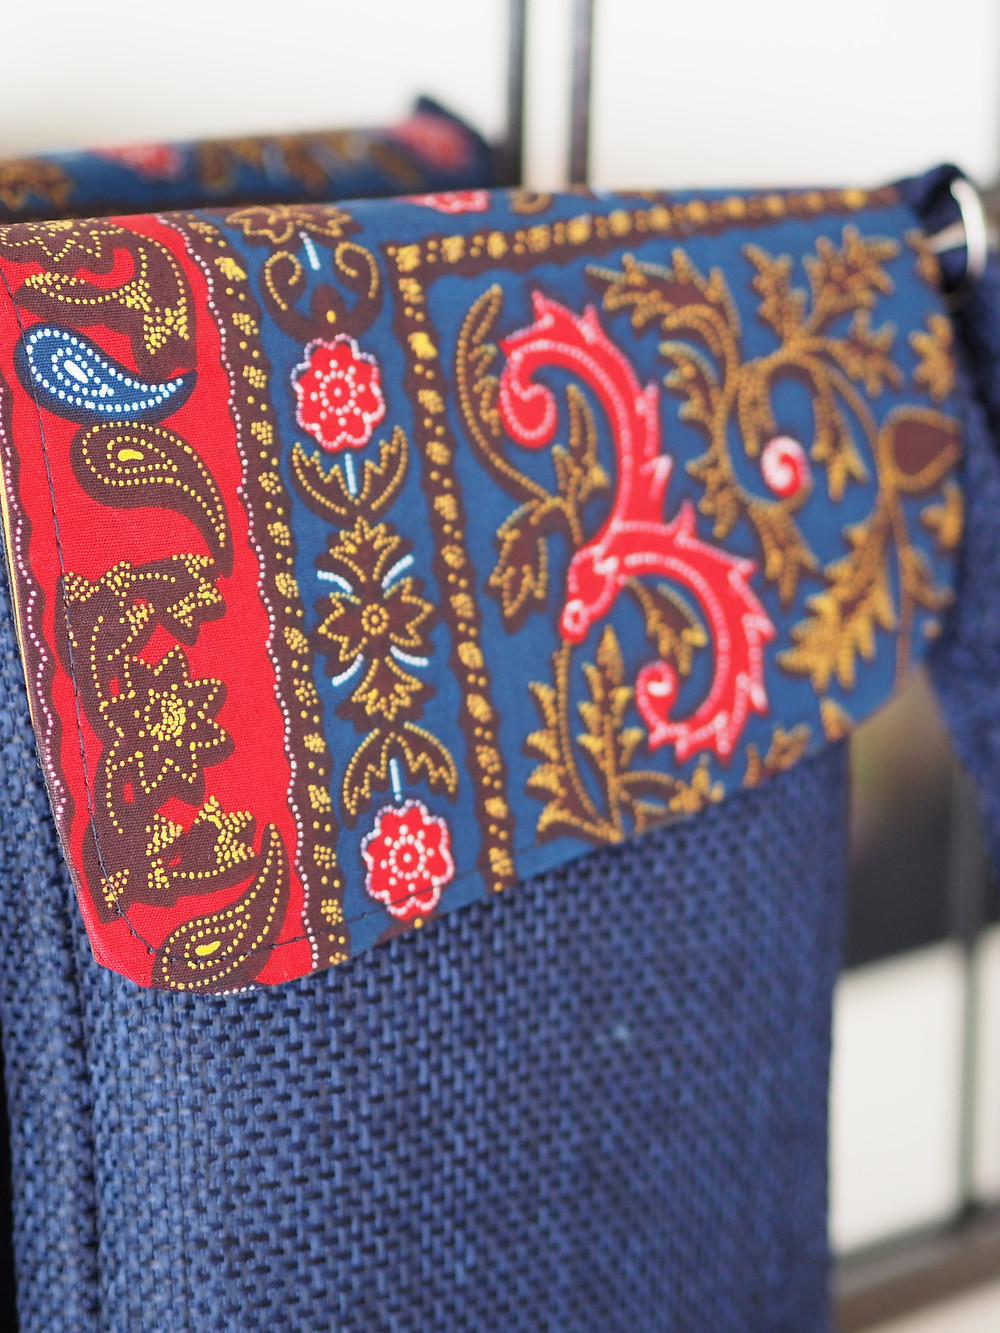 Kenyan kikoy fabric adorning a handmade navy handbag